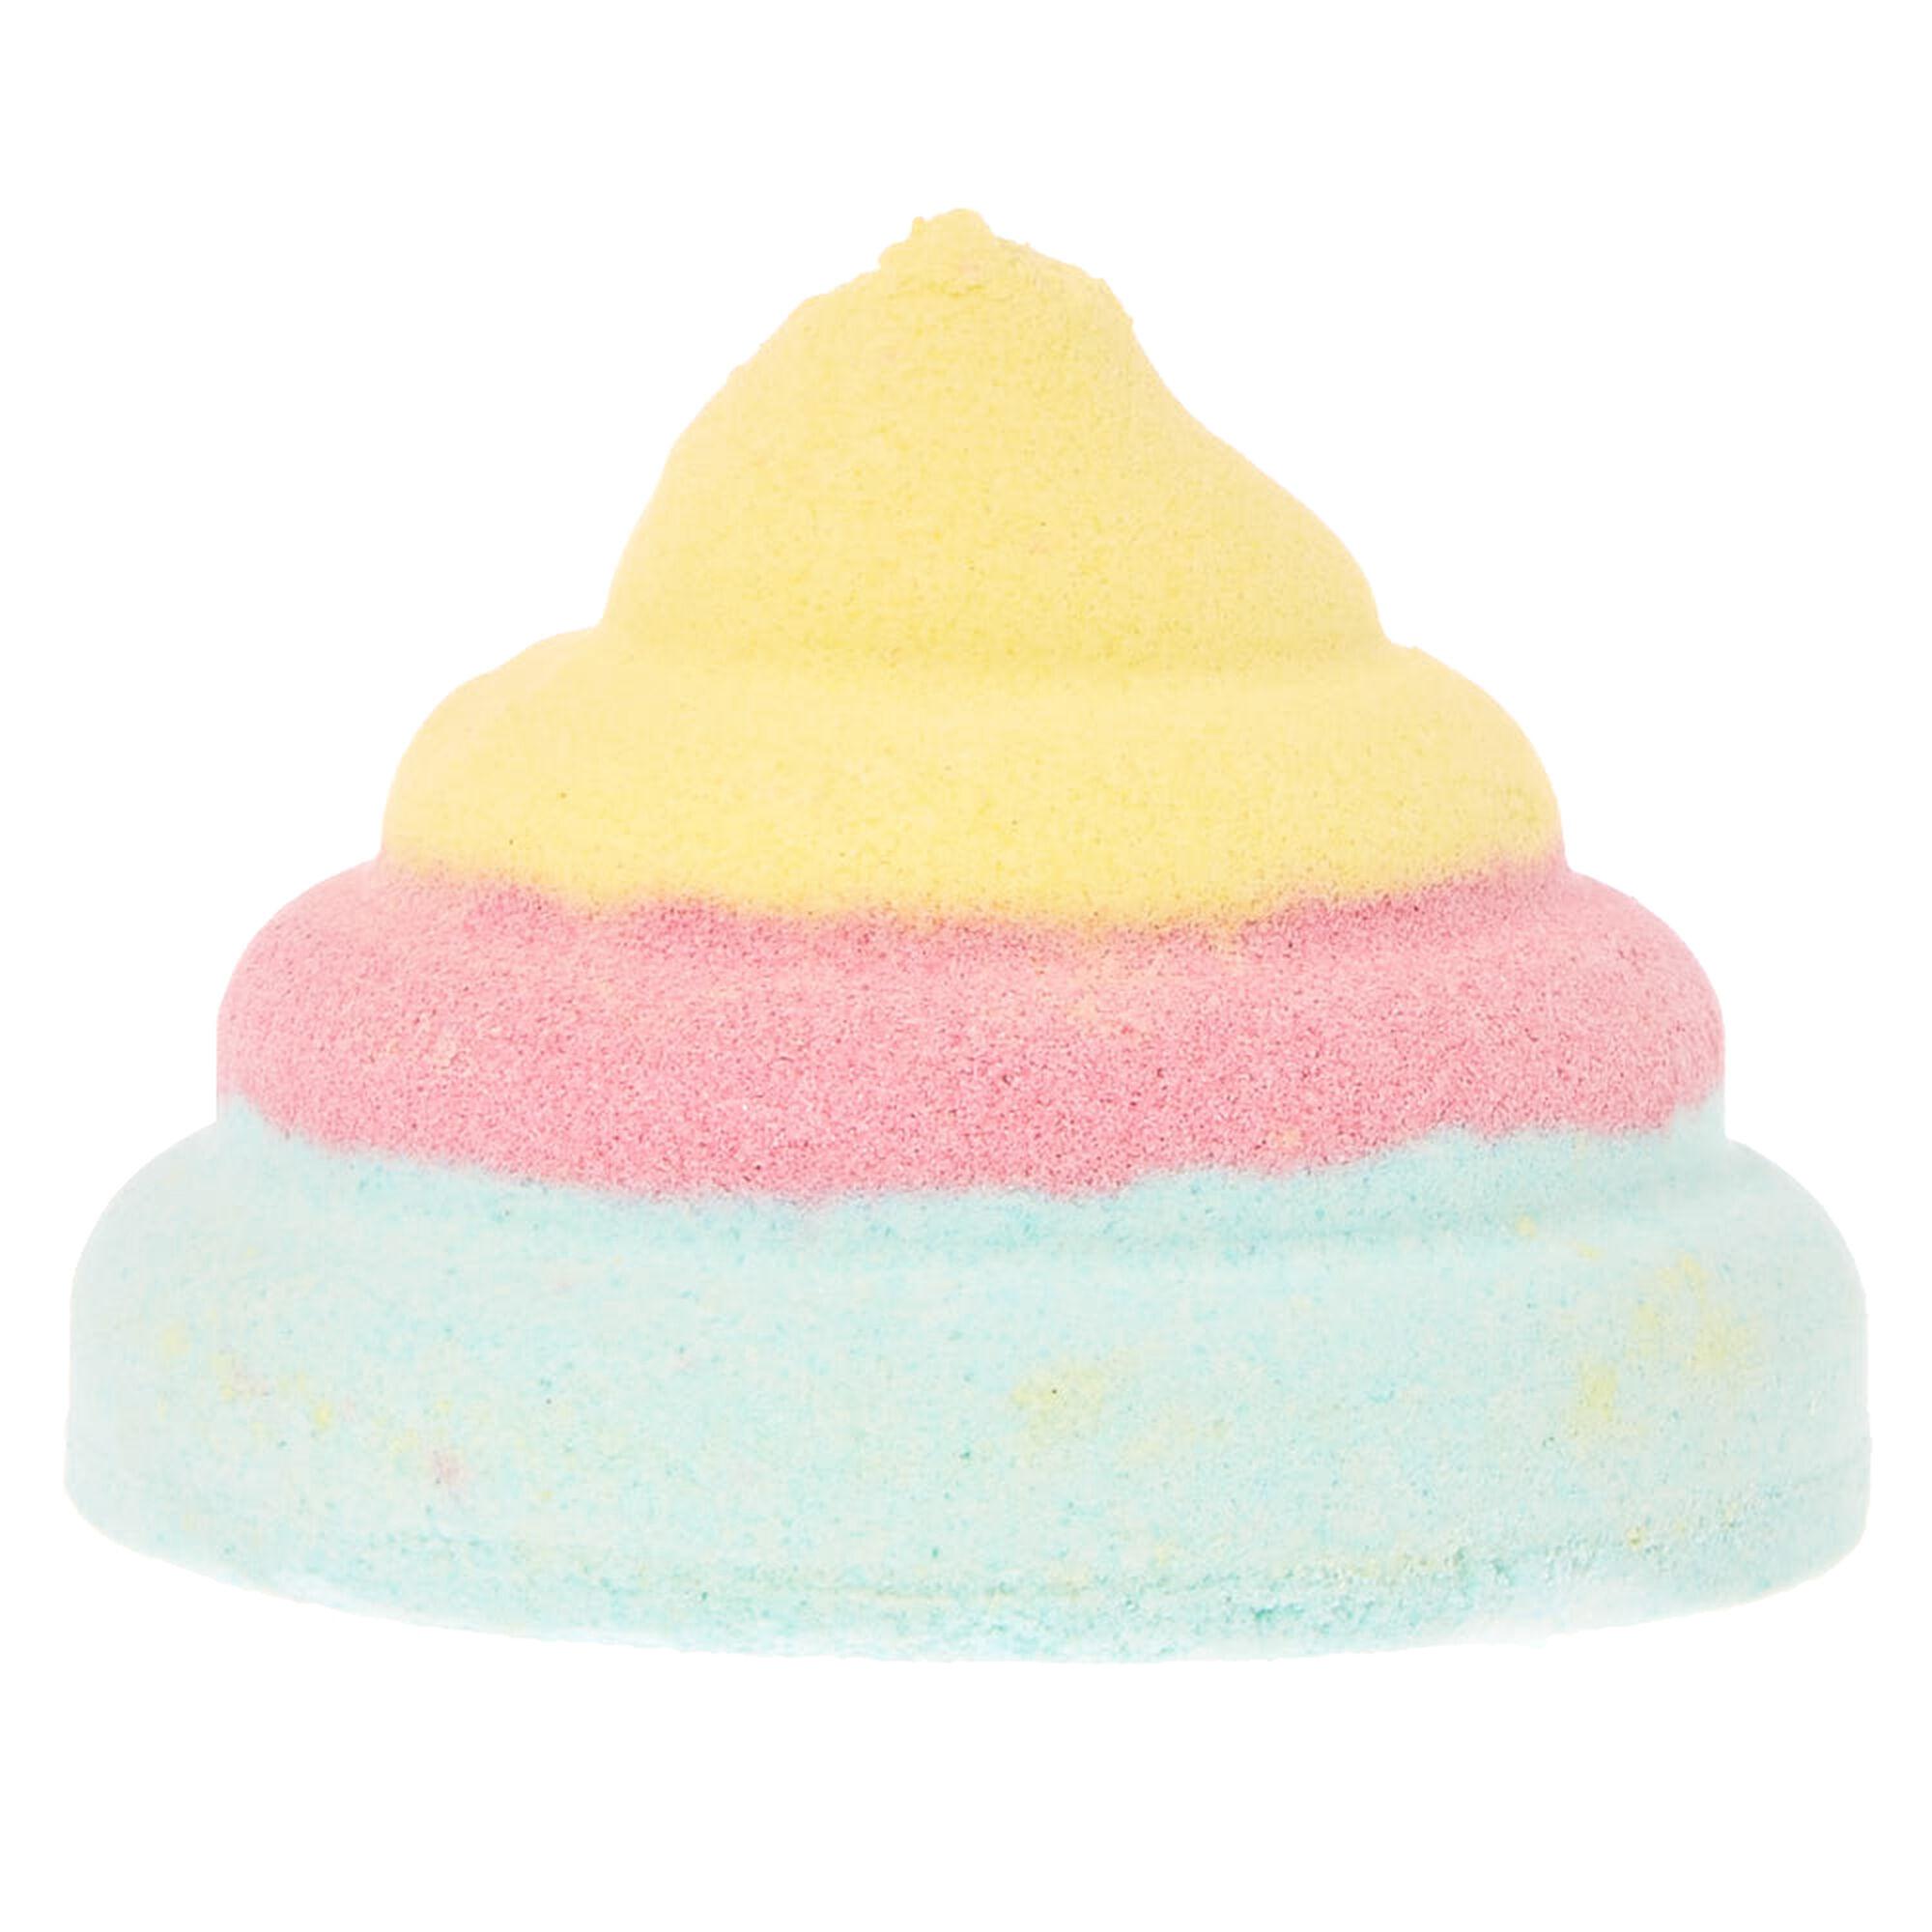 Rainbow Unicorn Poo Strawberry Scented Bath Bomb | Claire\'s US